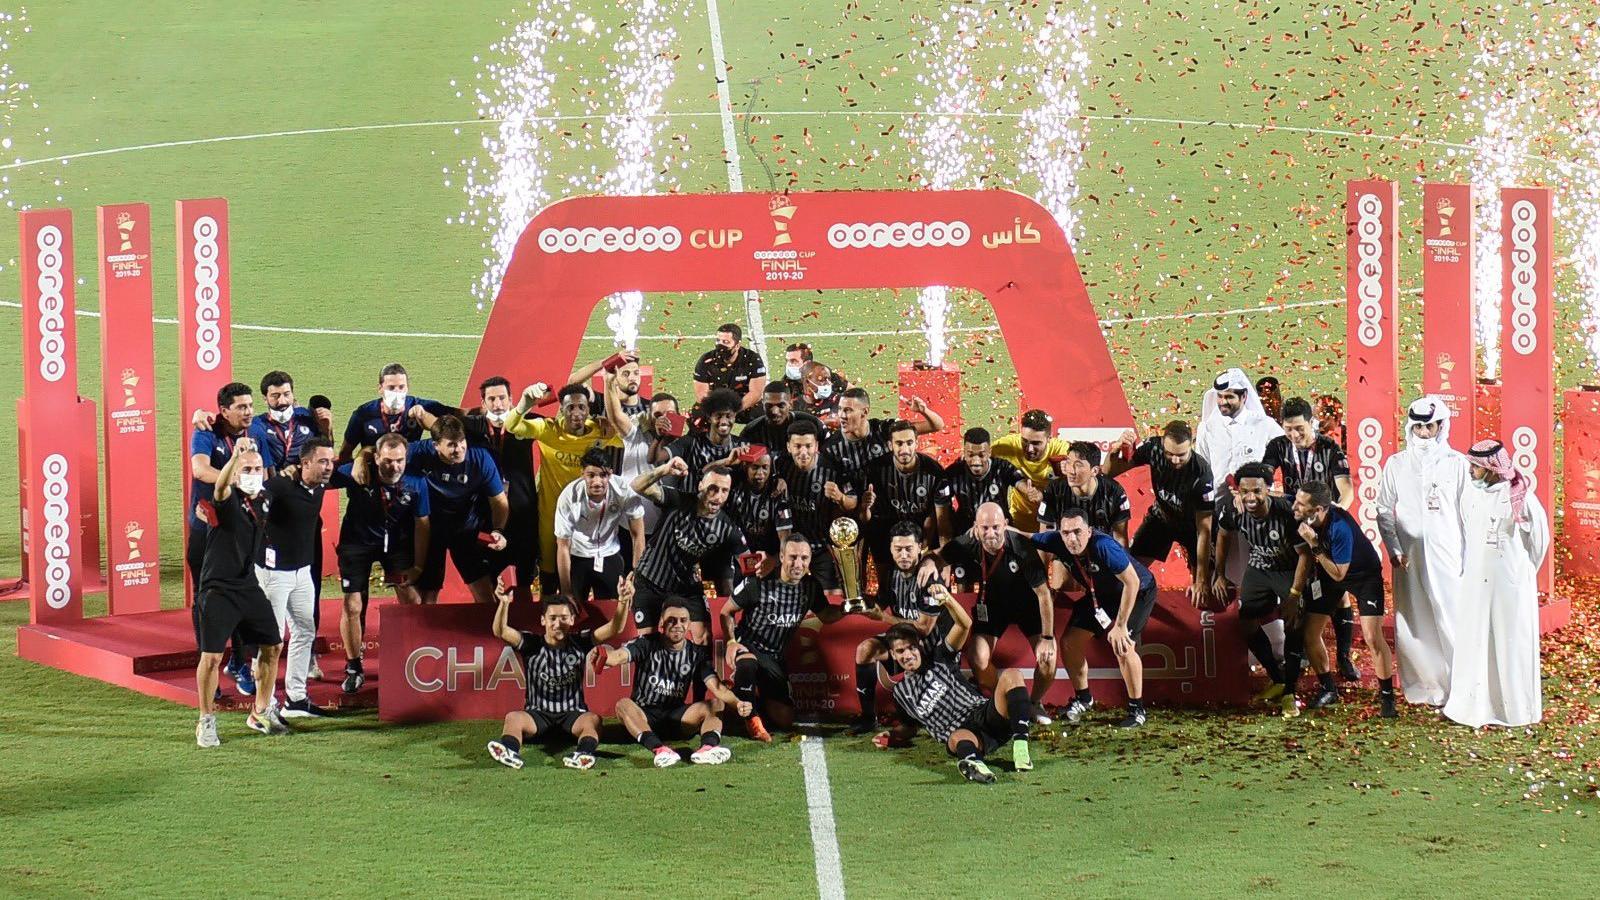 Al Sadd wallop Al Arabi 4-0 to claim Ooredoo Cup title